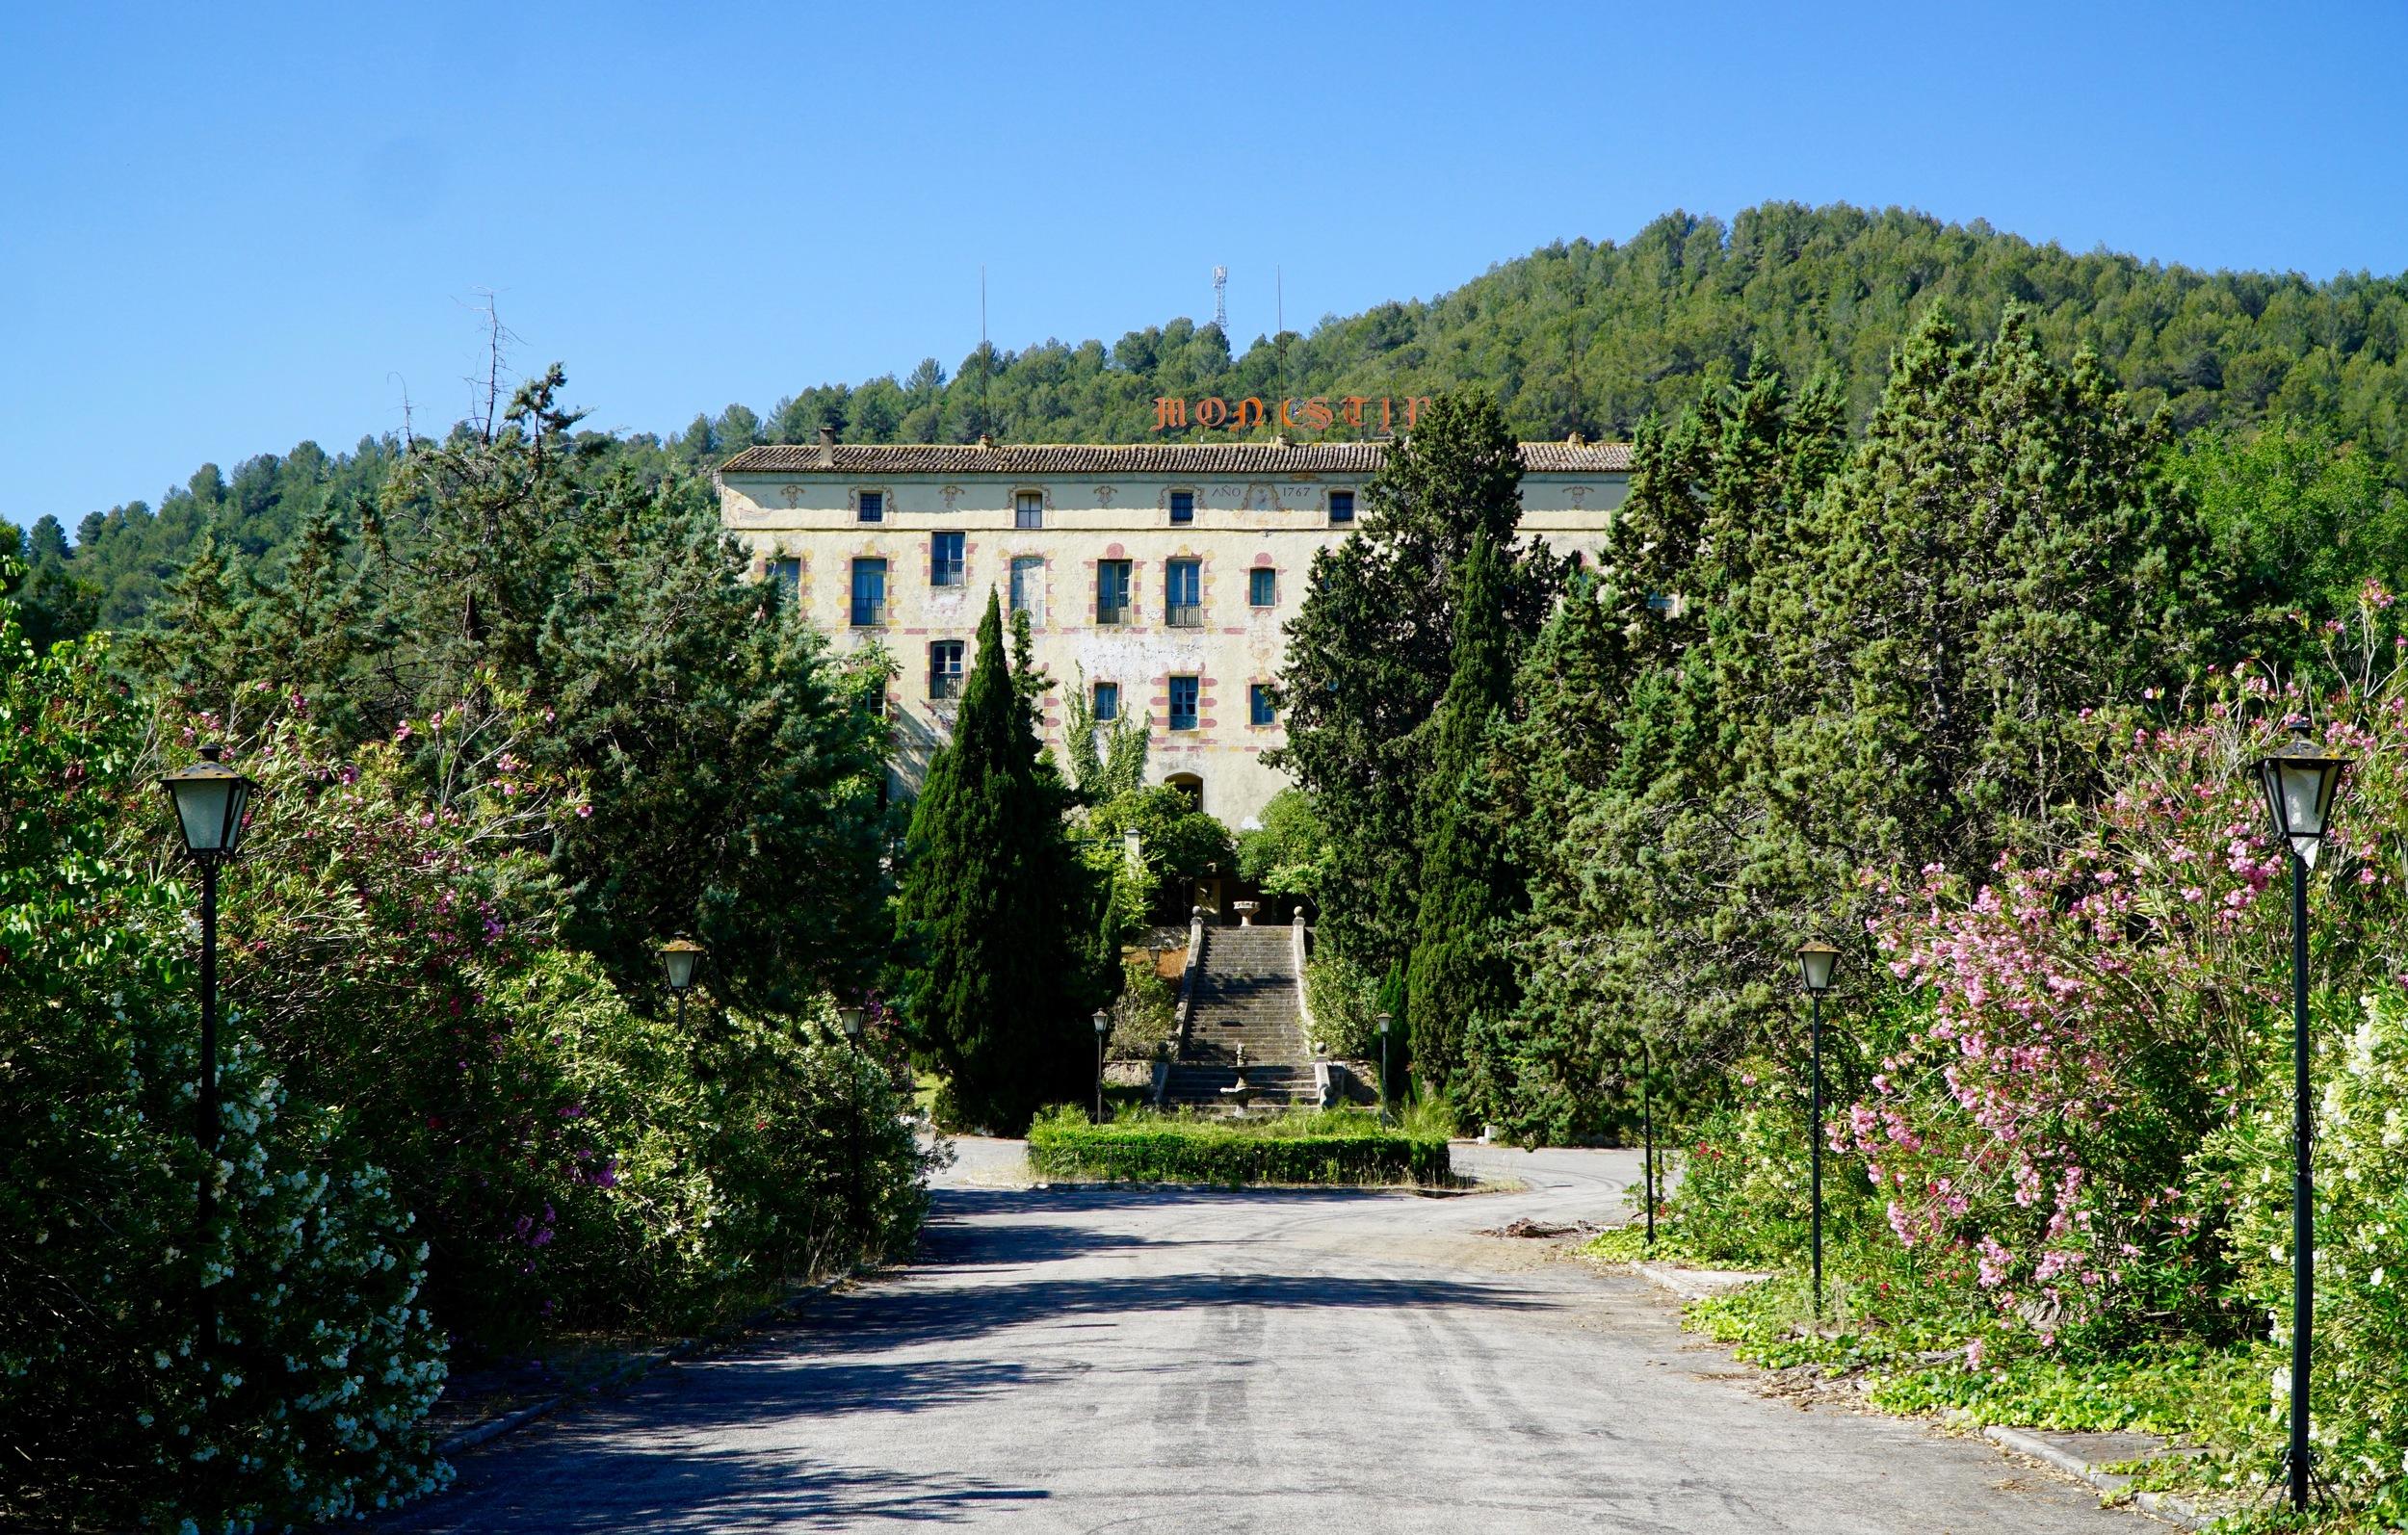 Convento de Aguas Vivas